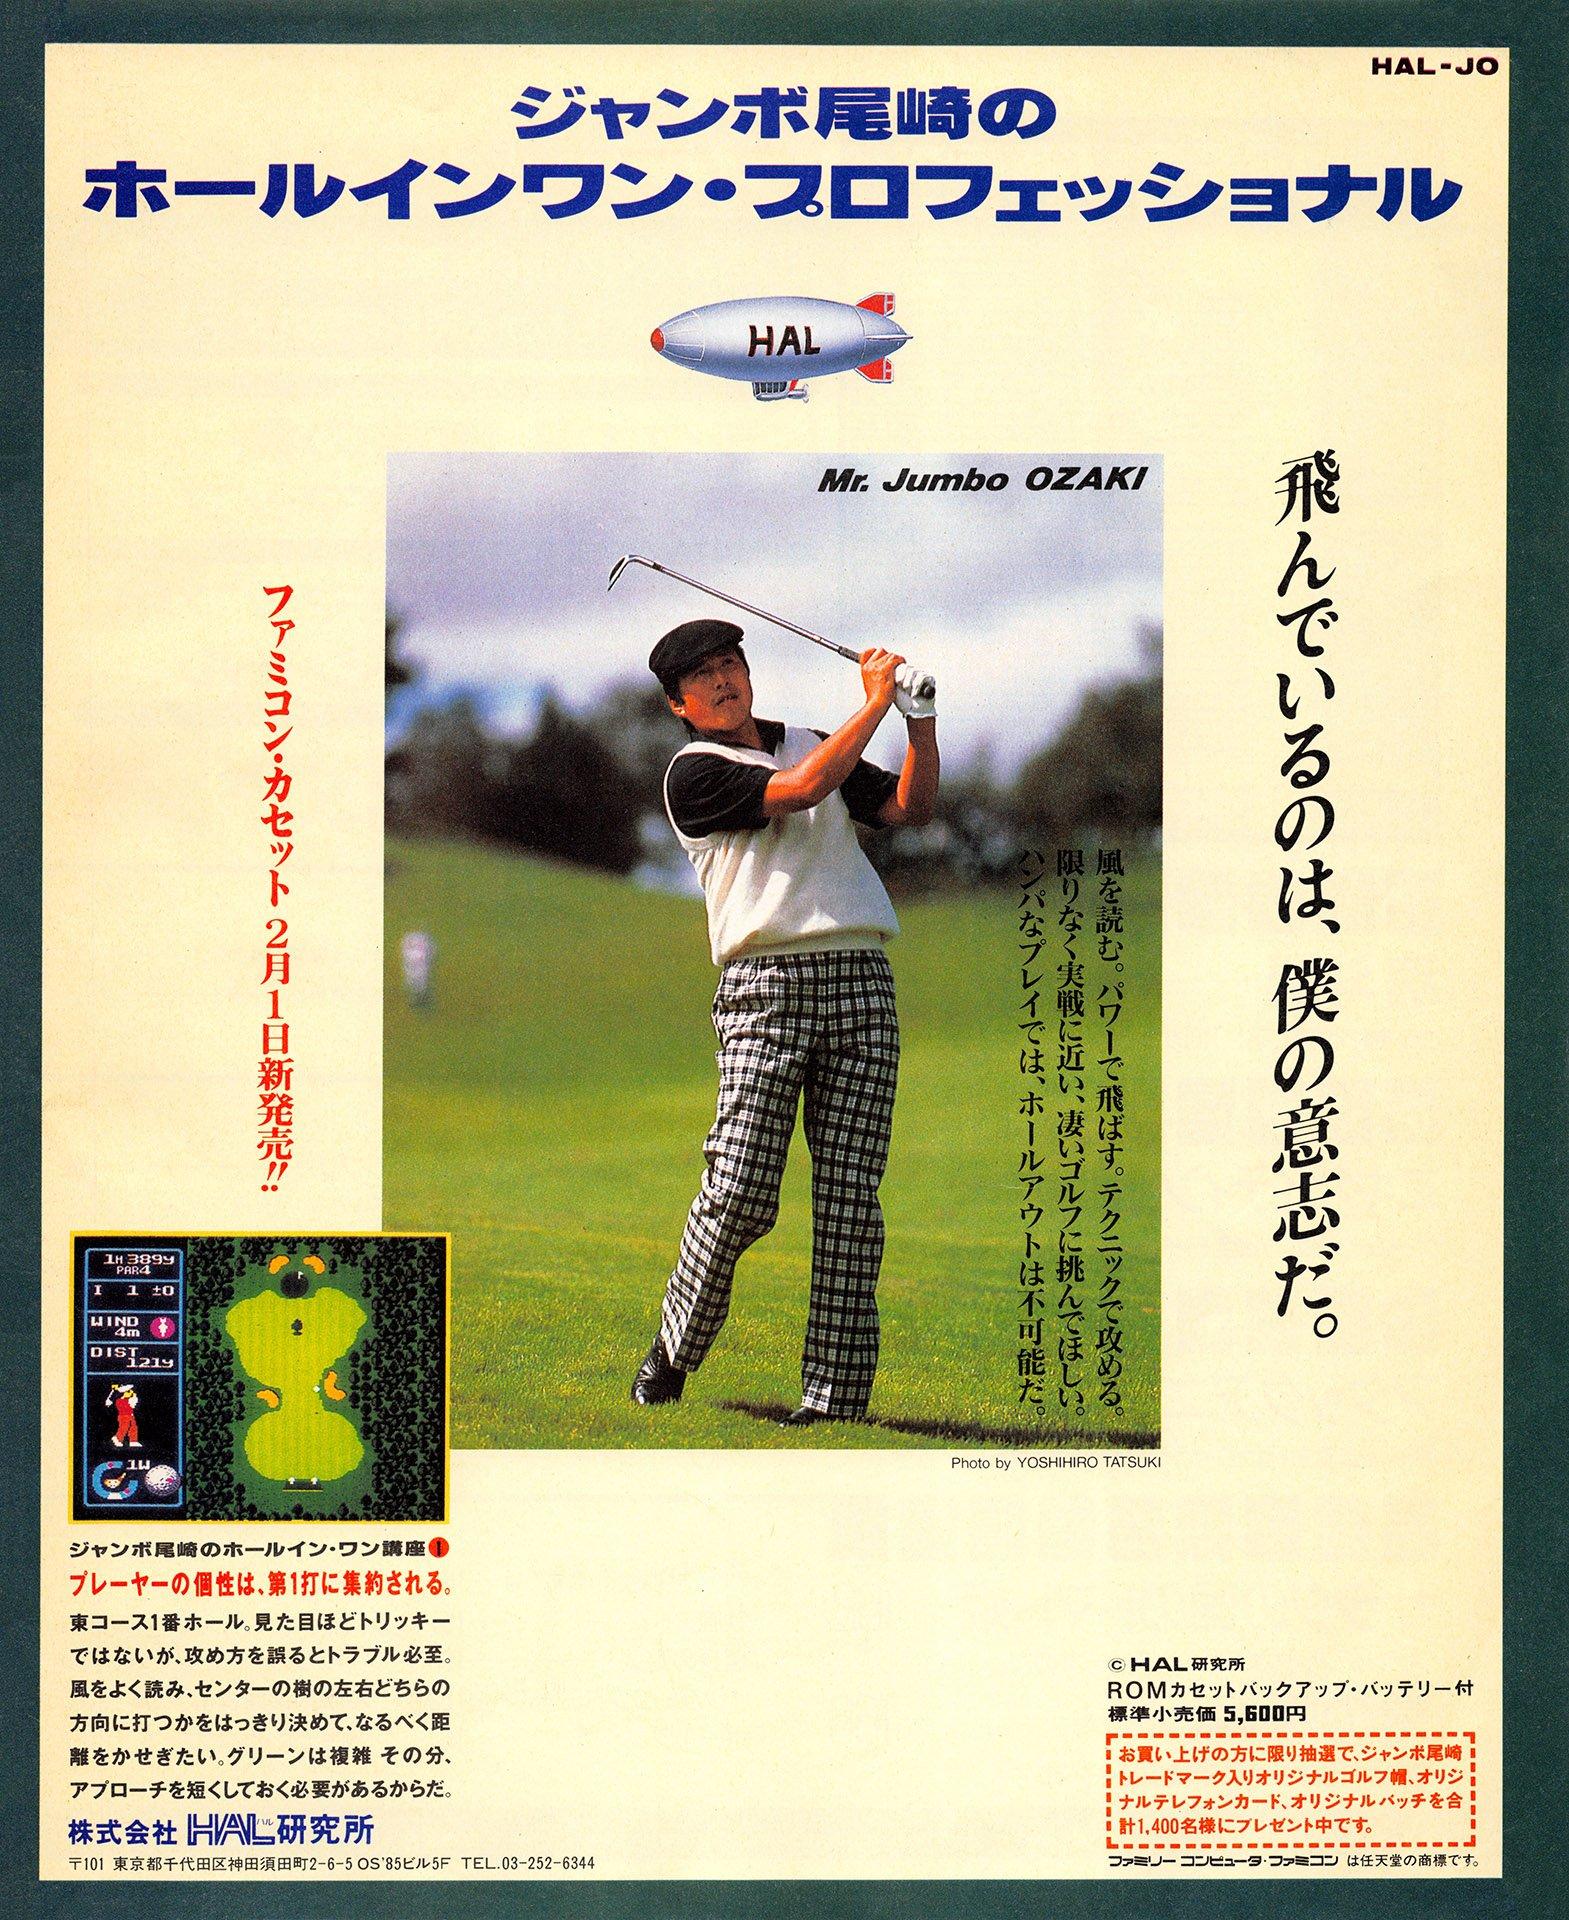 Jumbo Ozaki no Hole-in-One Professional (Japan)